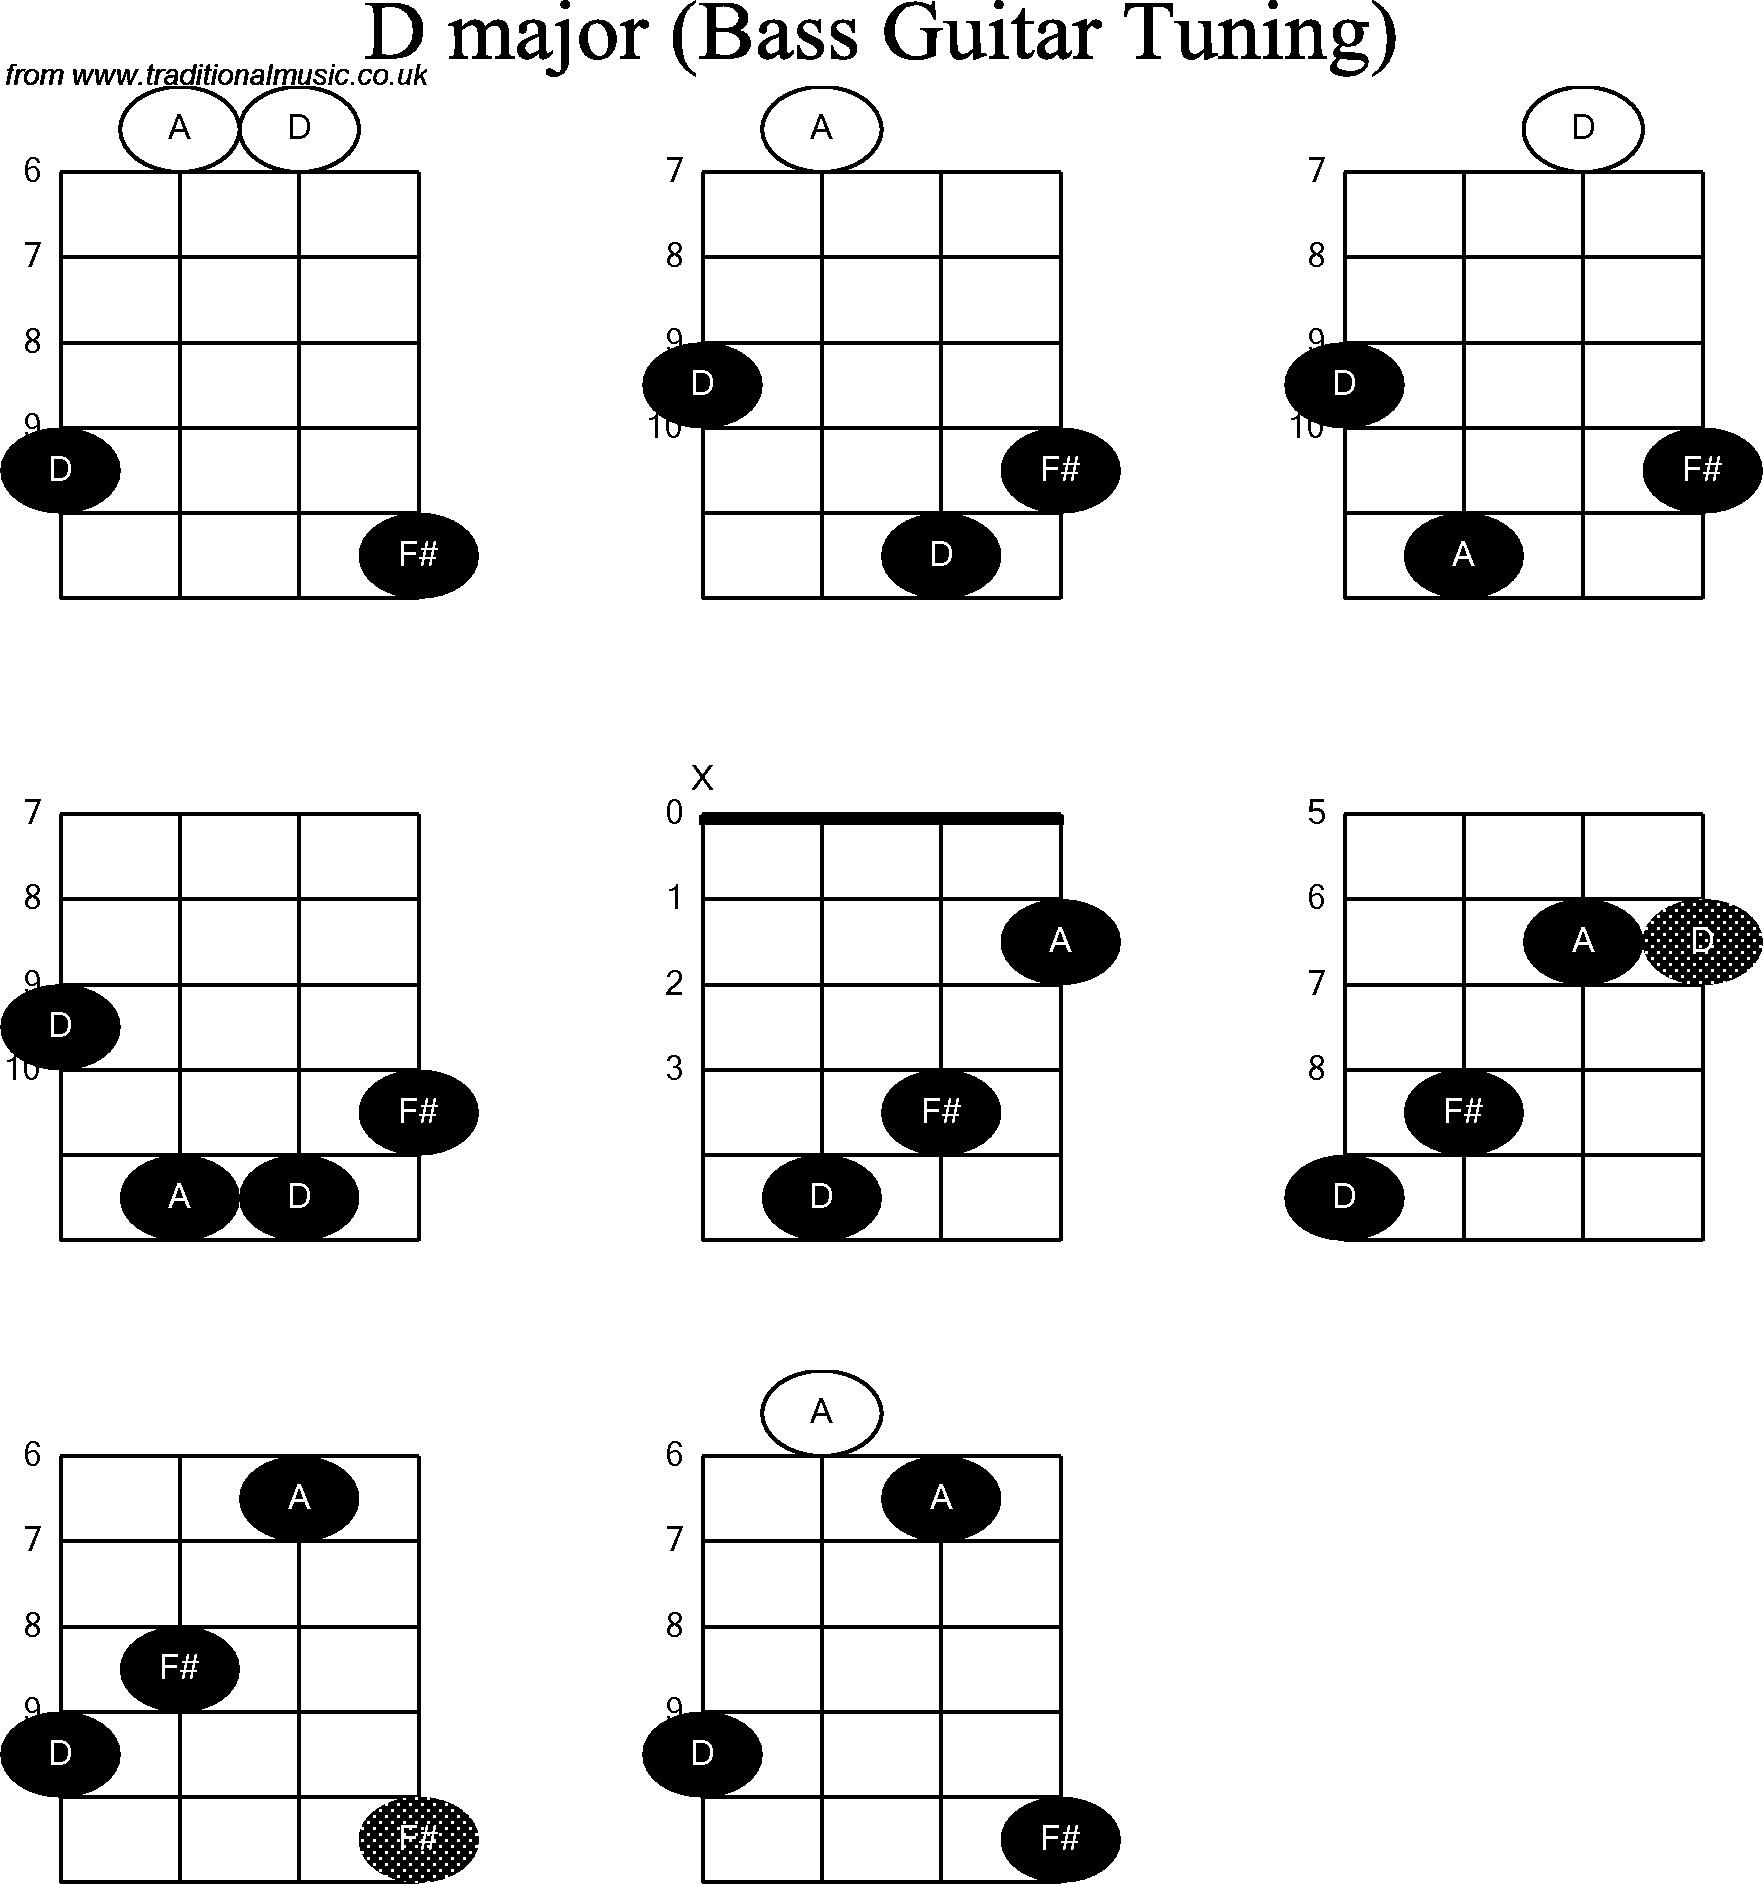 Bass Guitar Chords Bass Guitar Chord Diagrams For D